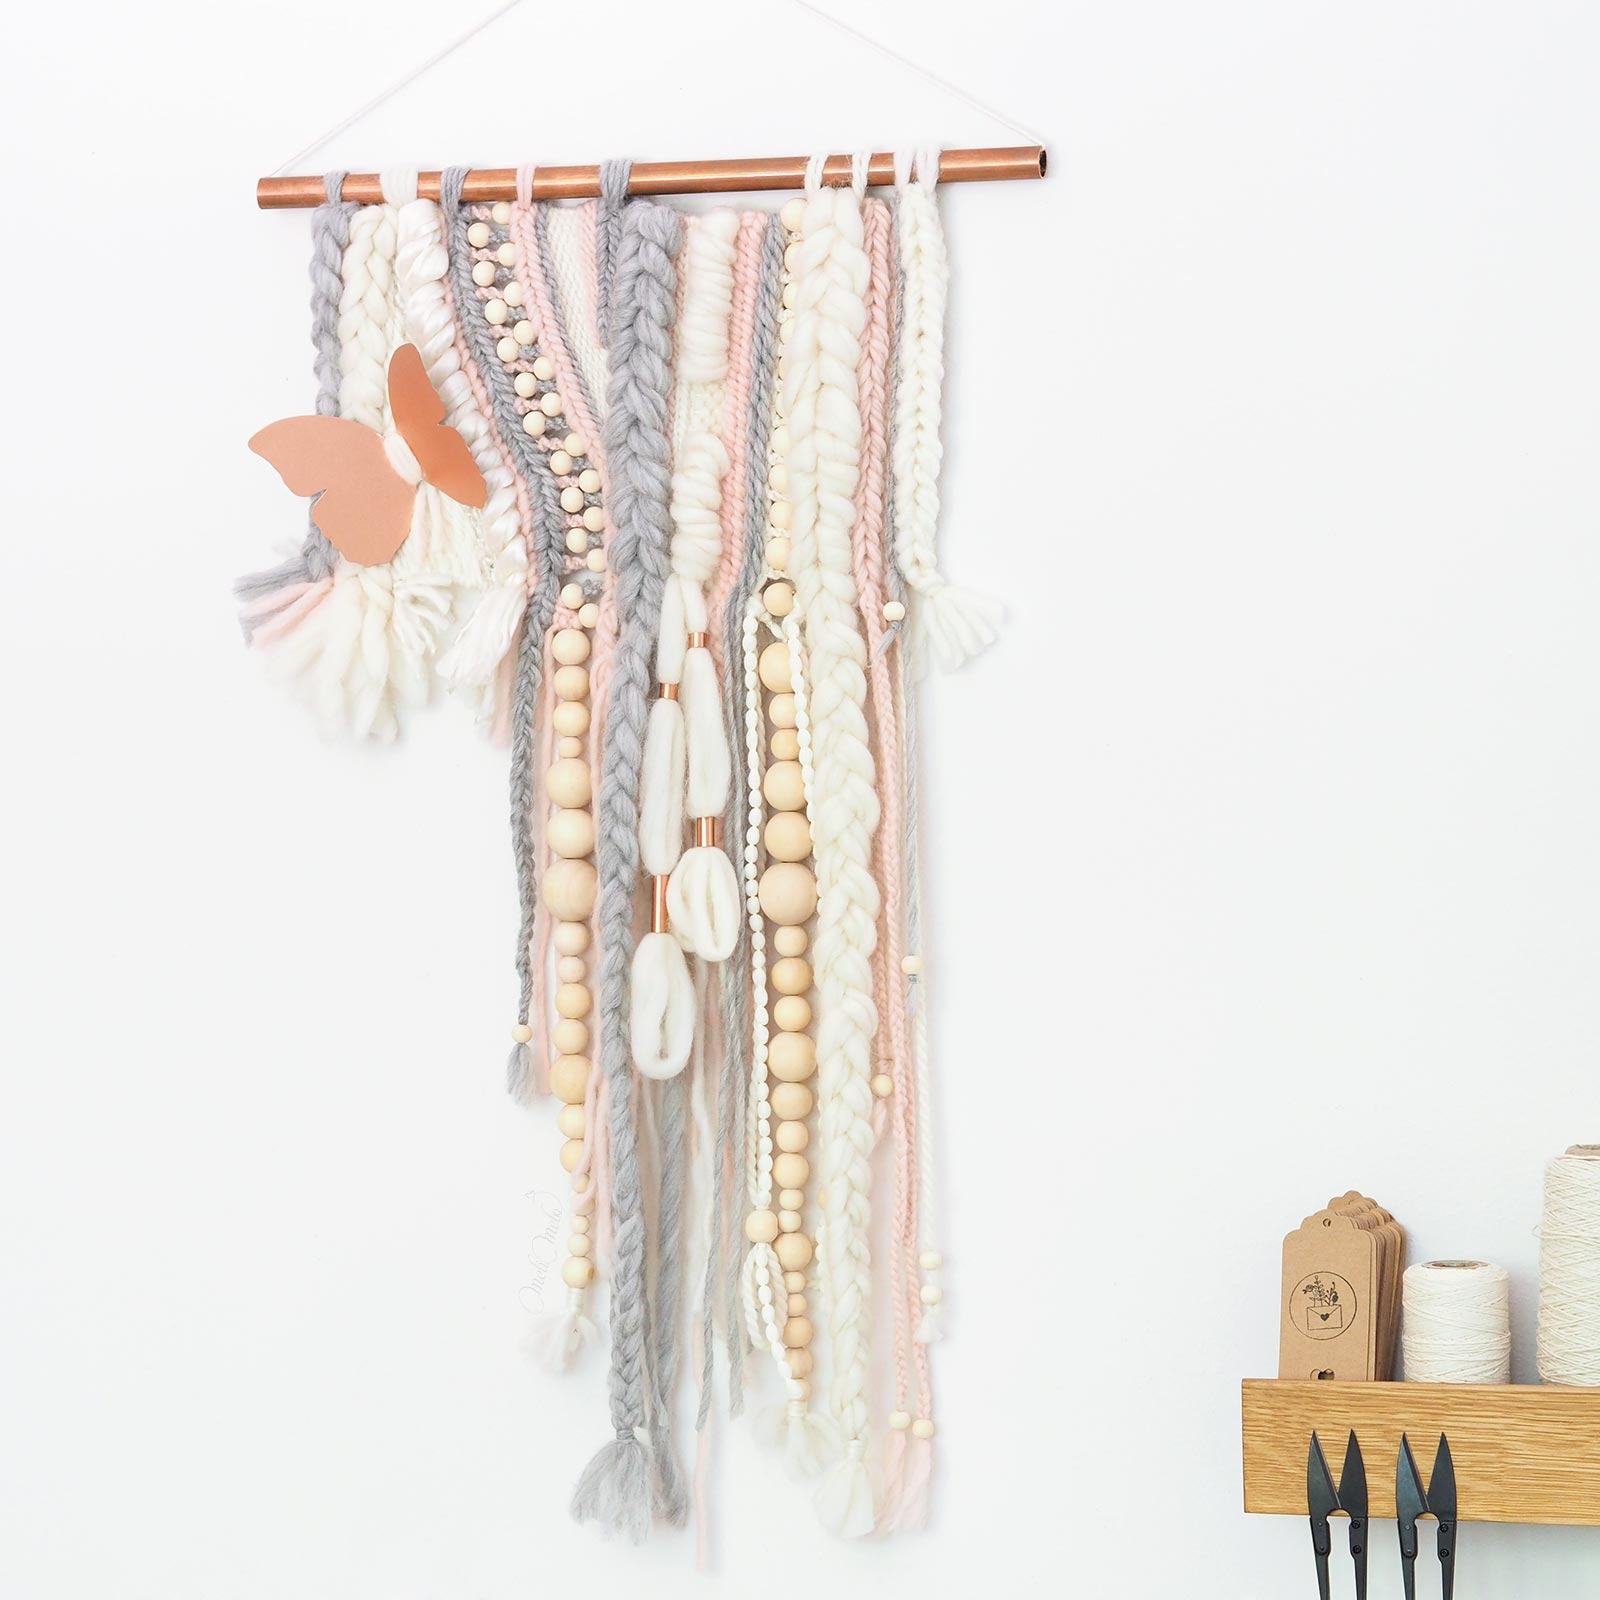 Tissage format paysage papillon cuivre bois rose laine merino wool woolandthegang funem studio handweaving laboutiquedemelimelo